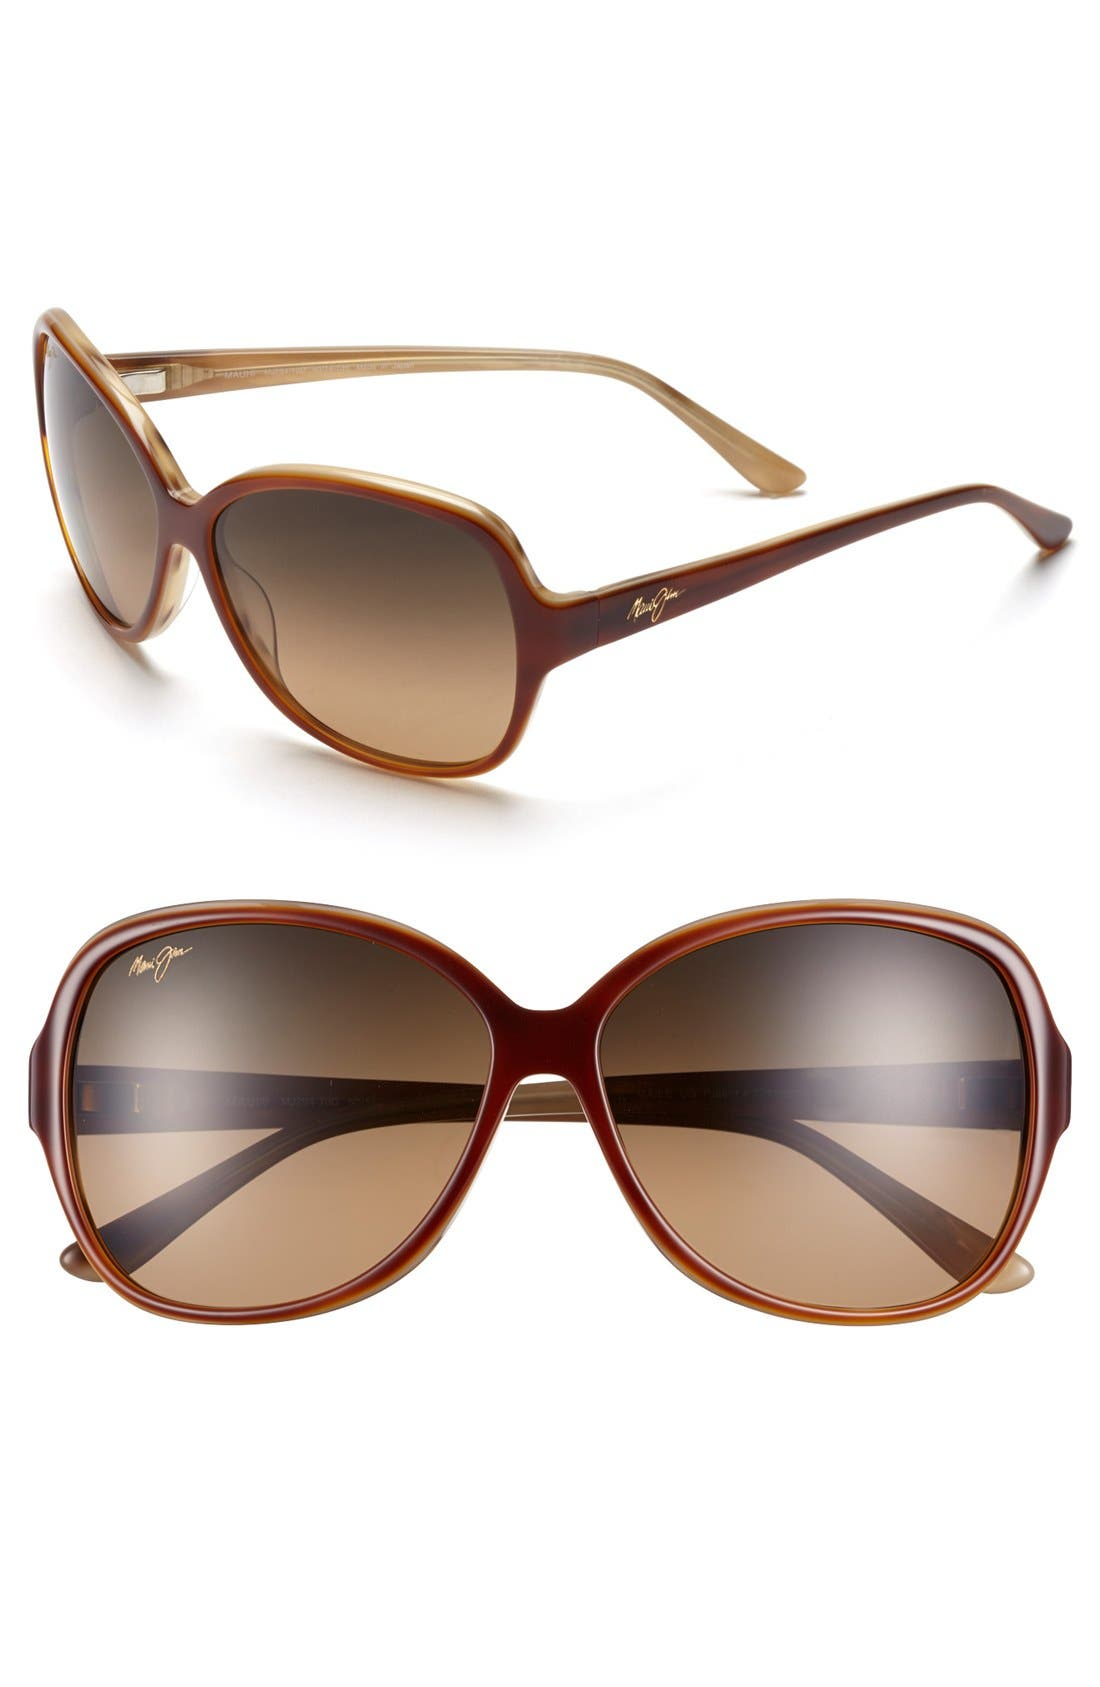 Maile 60mm PolarizedPlus<sup>®</sup> Sunglasses,                         Main,                         color, Tortoise/ Ivory